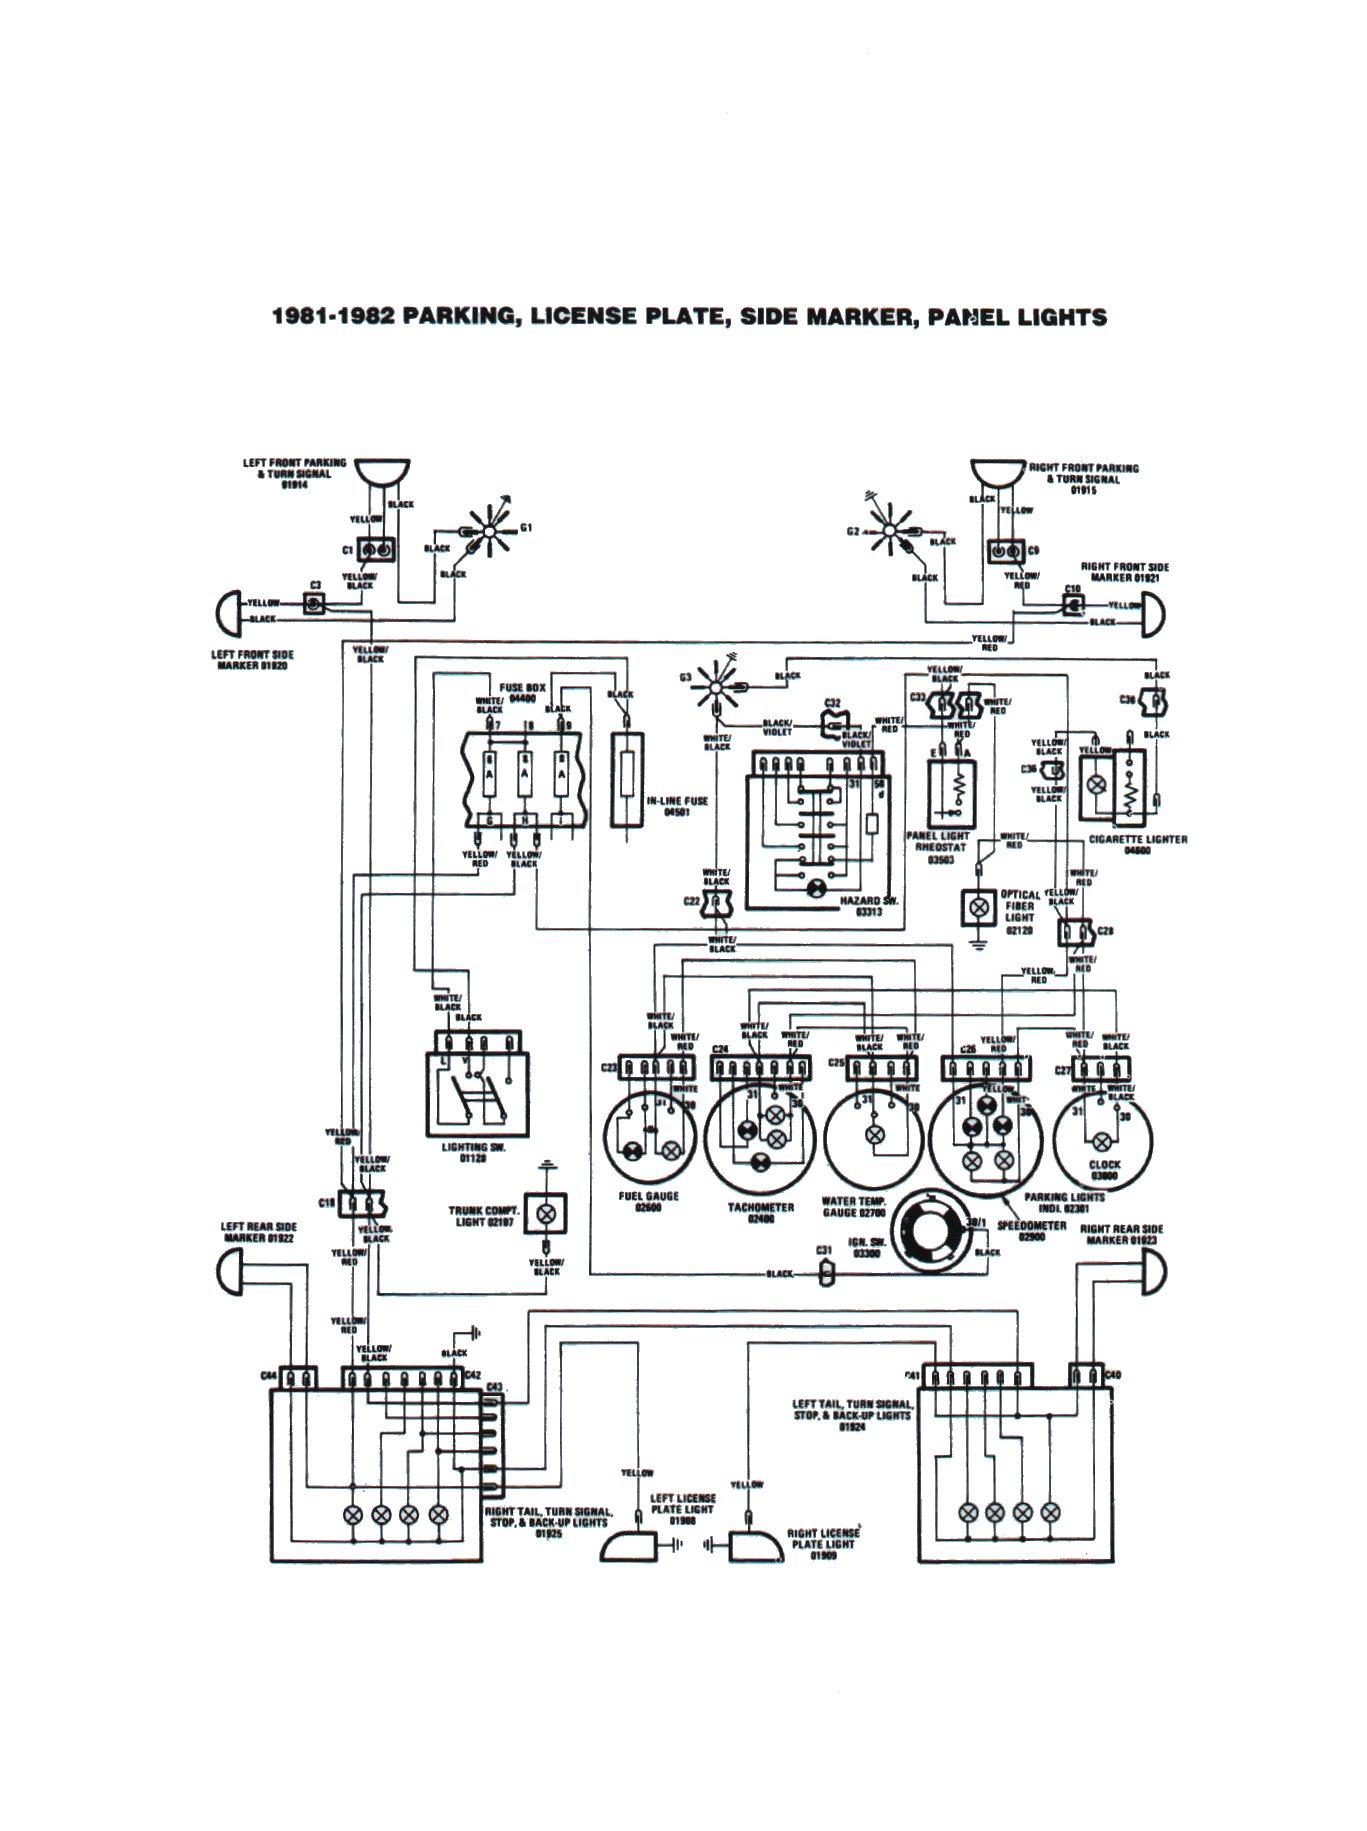 DK_8325] Fiat Spider Cso 2000 Electrical Wiring Diagram 81Phil Pical Tixat Mohammedshrine Librar Wiring 101